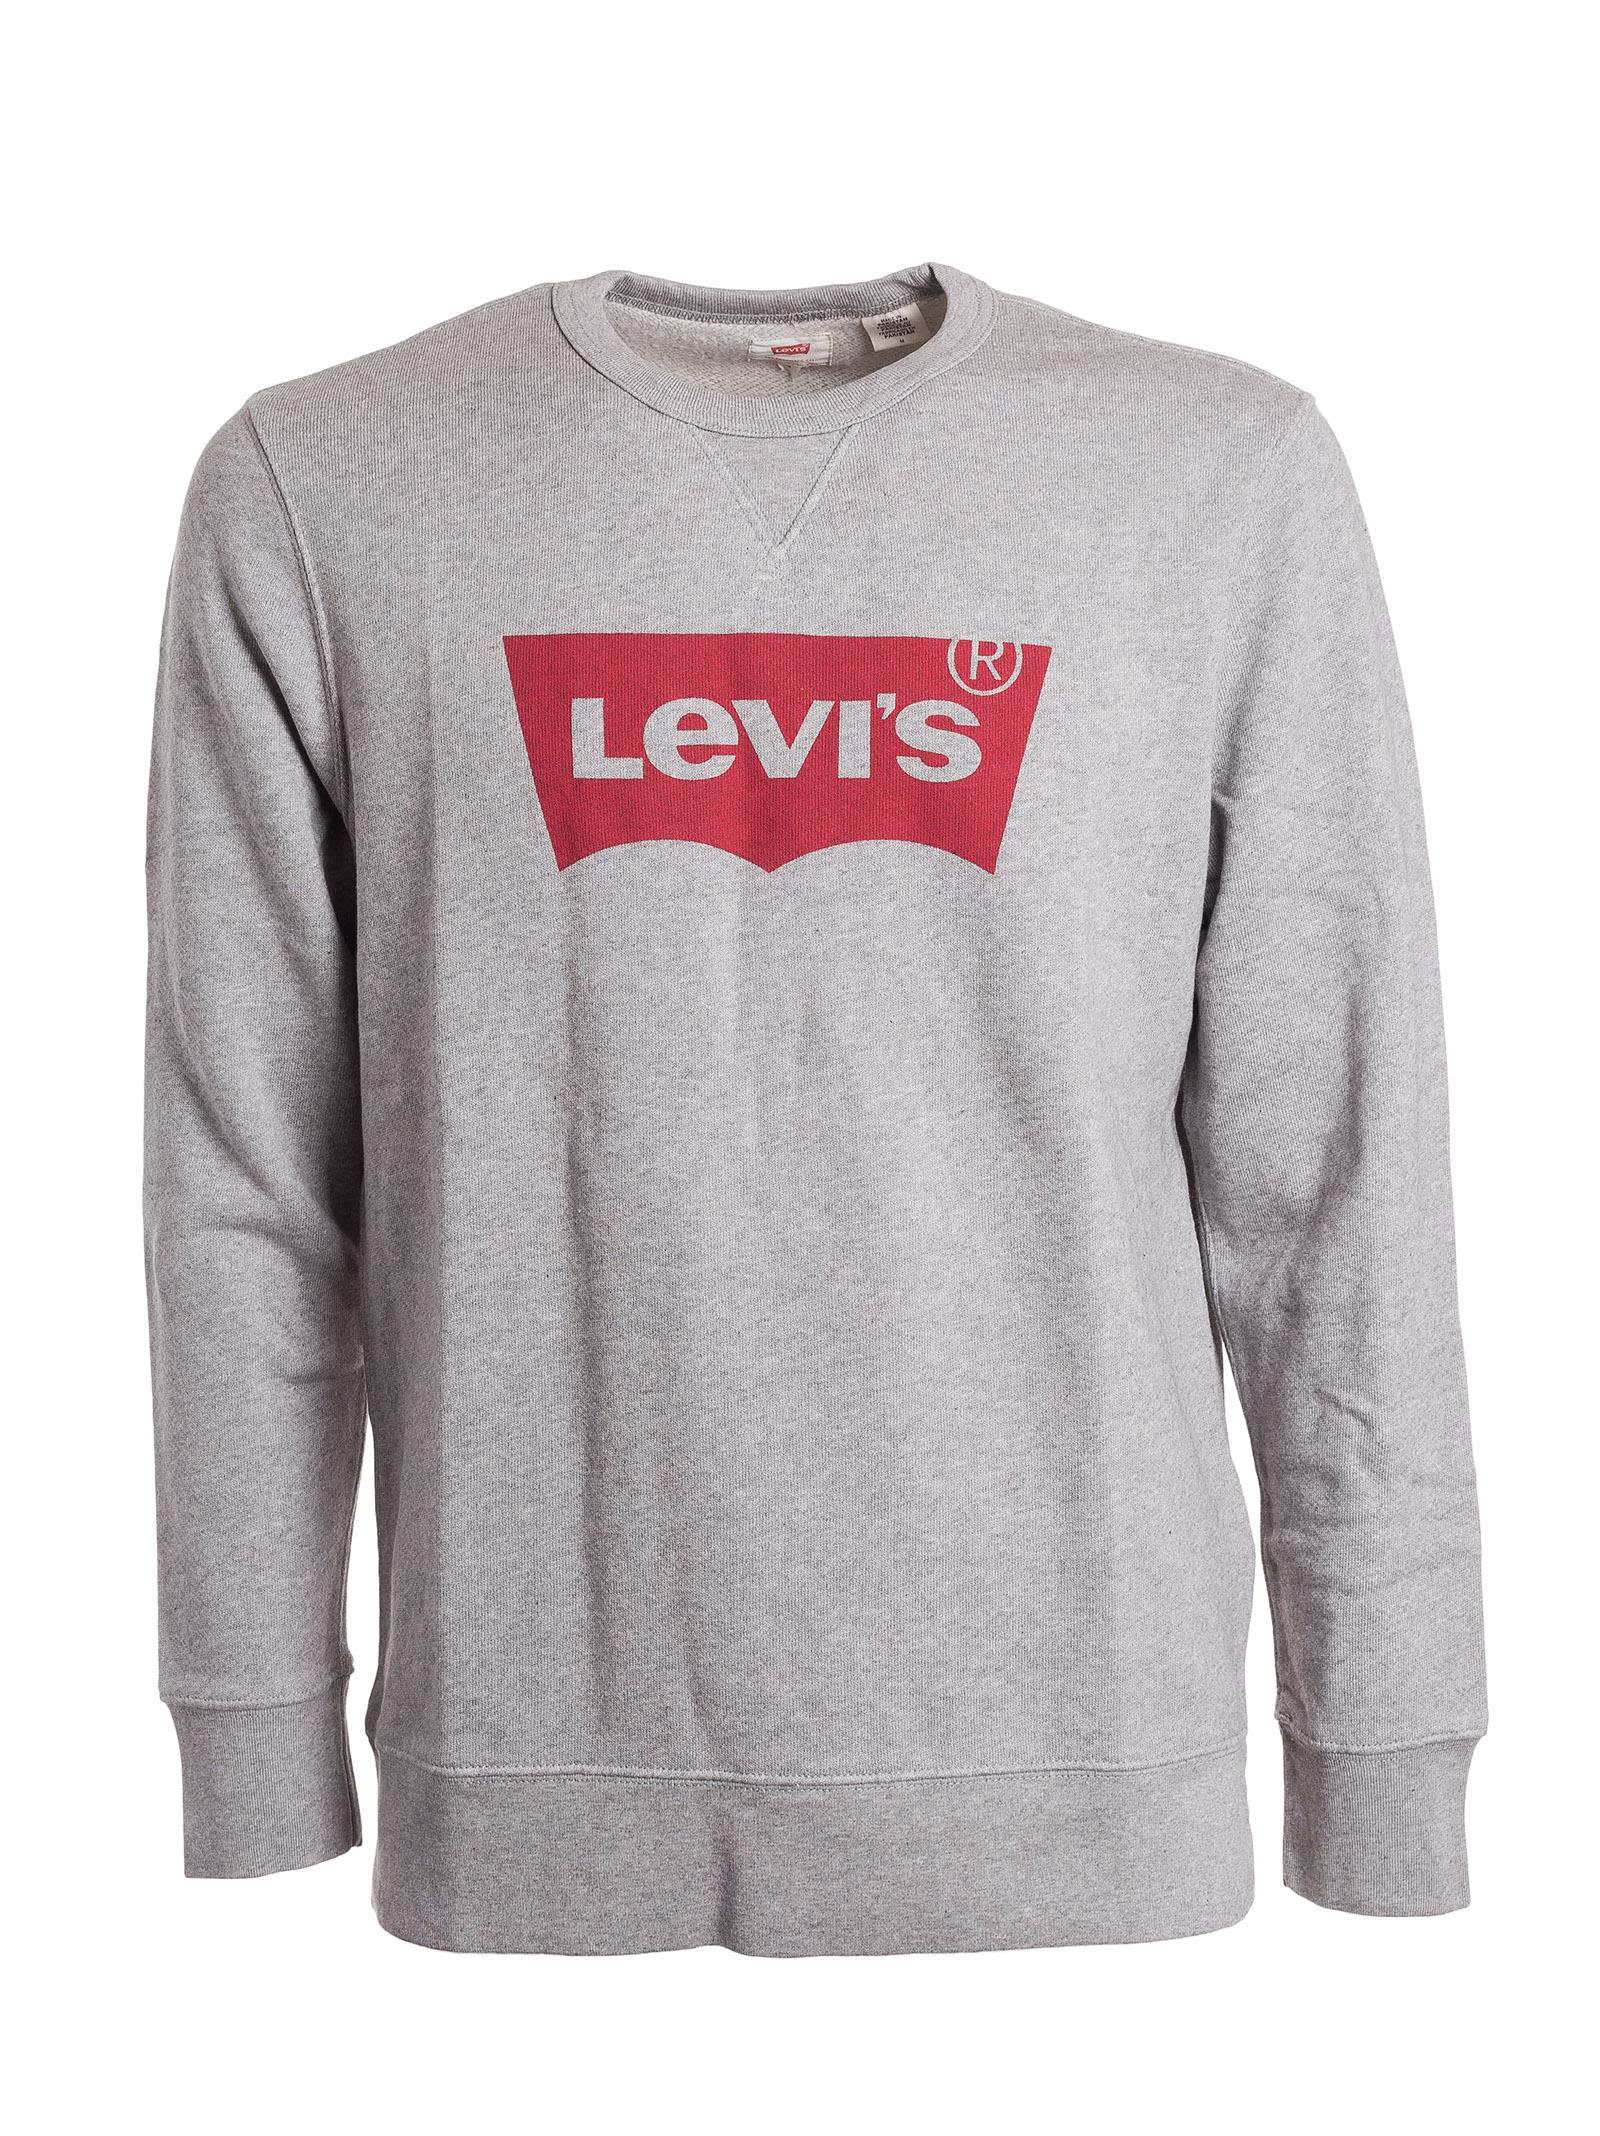 Levis Graphic Crew Sweatshirt